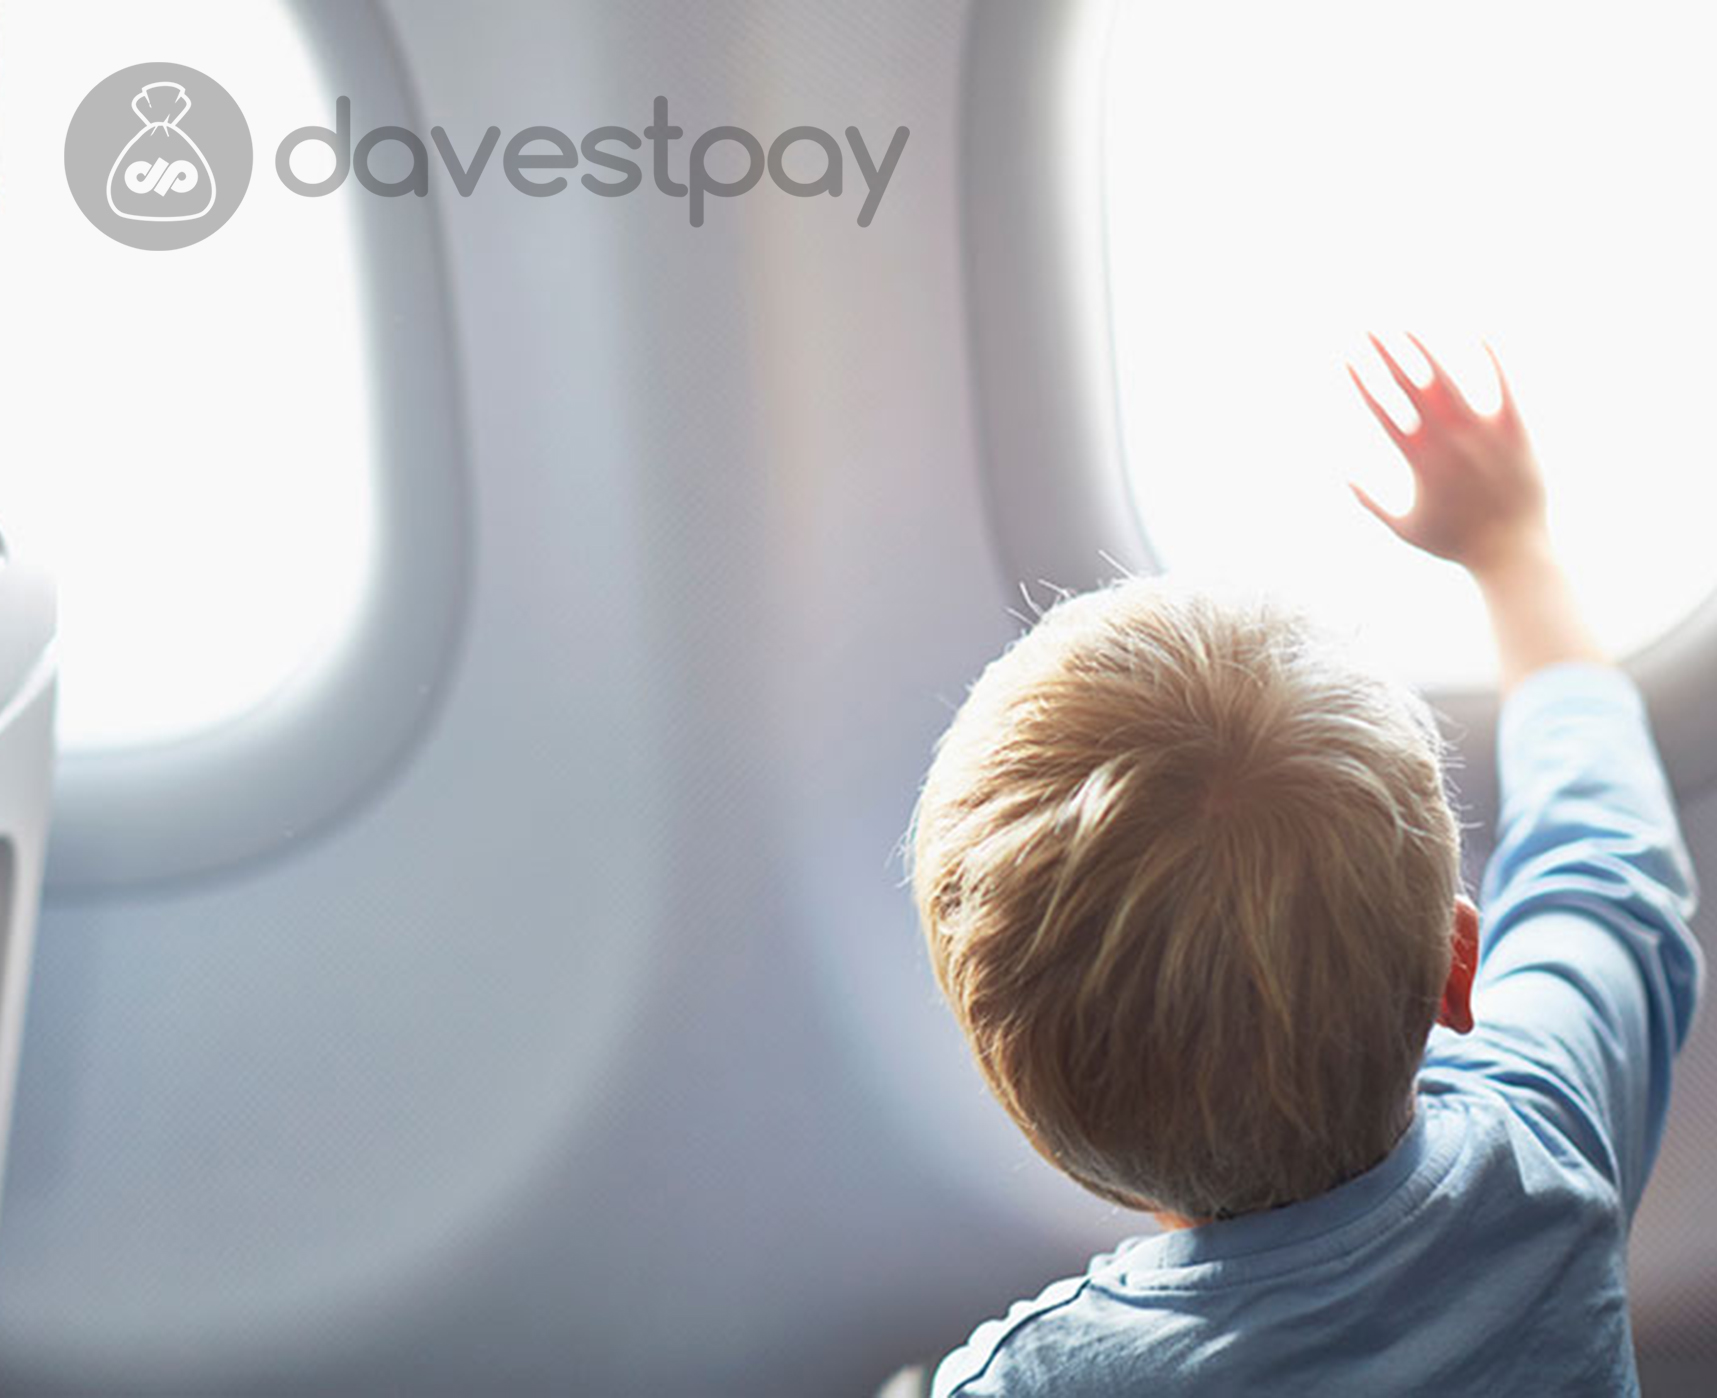 Tahu Peraturan Maskapai terhadap Bayi Saat Naik Pesawat